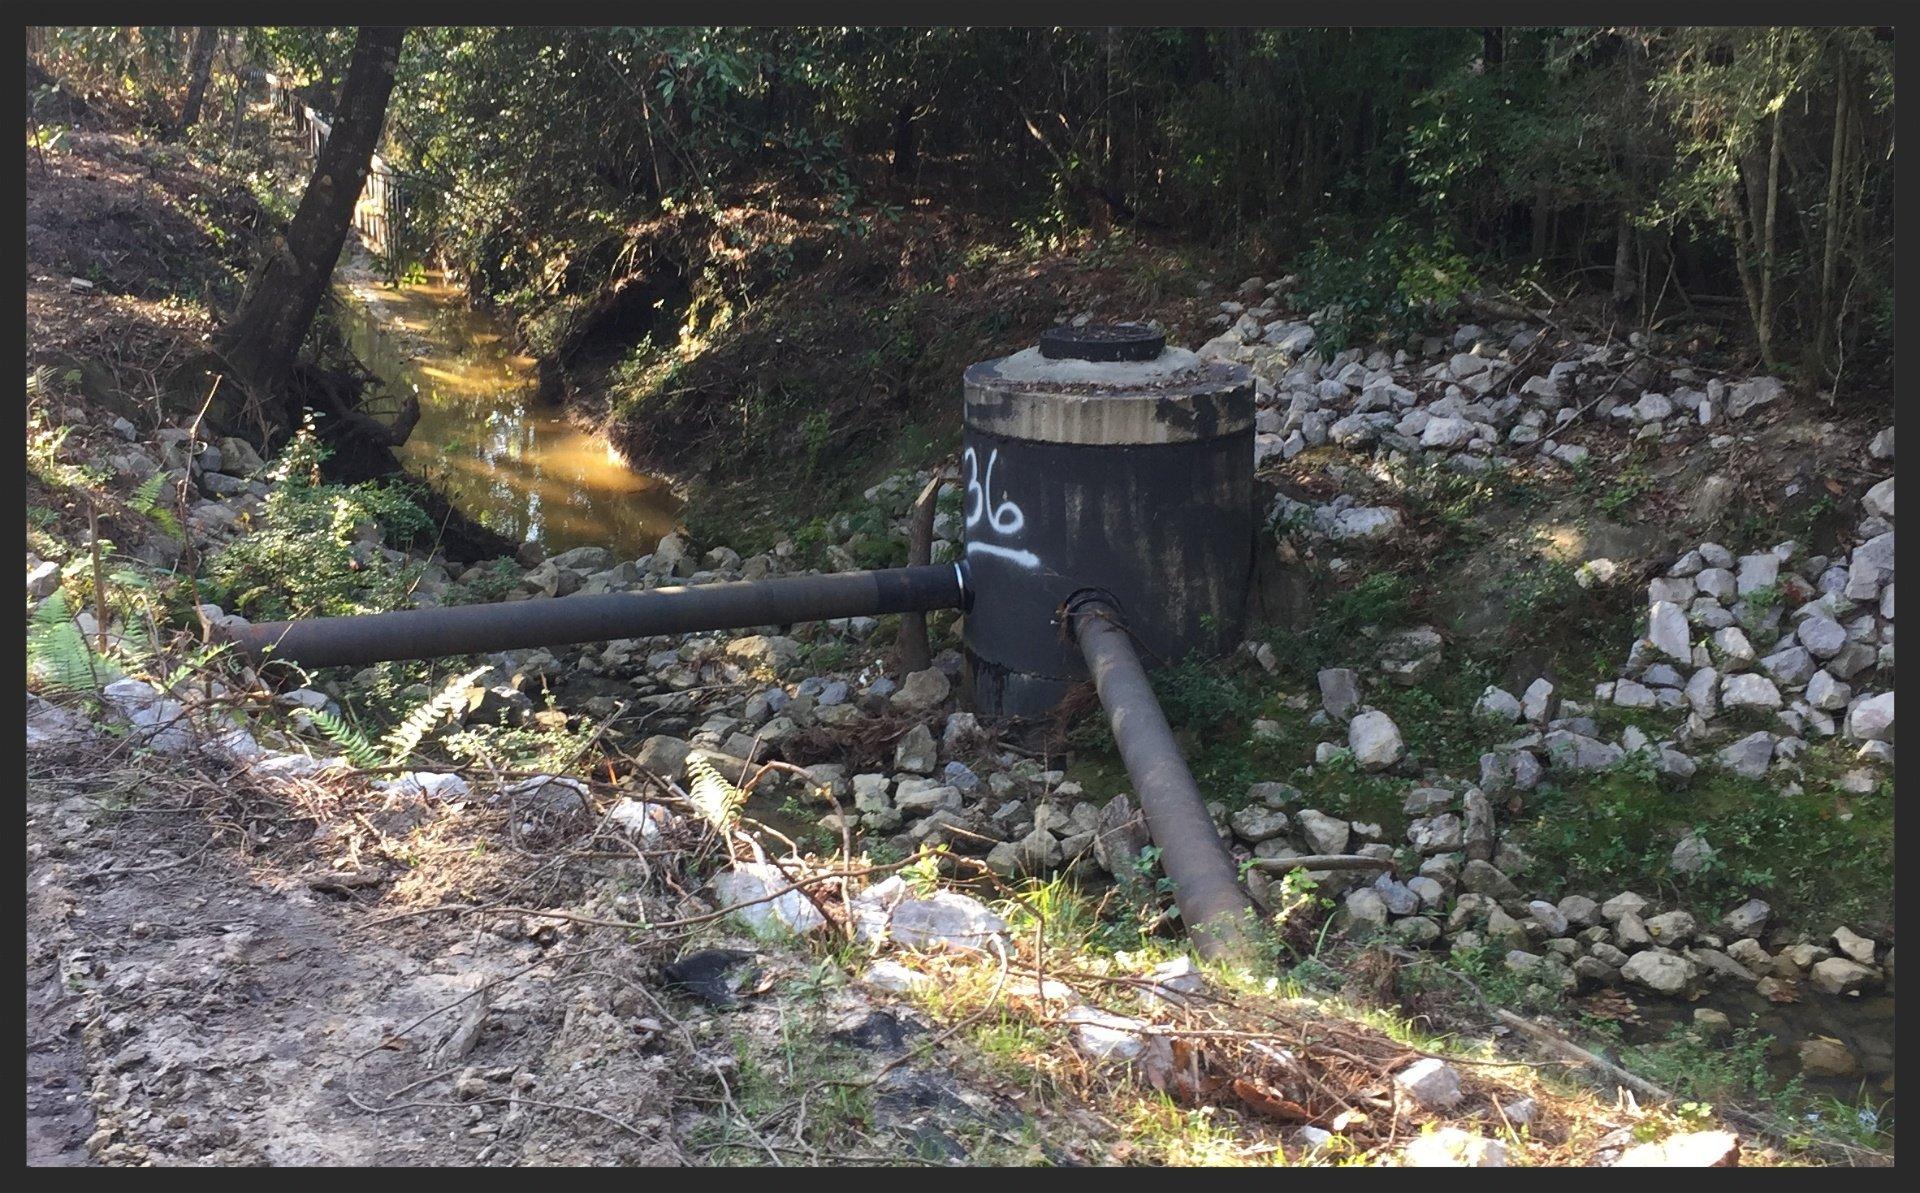 Manhole & Two Sewer Mains